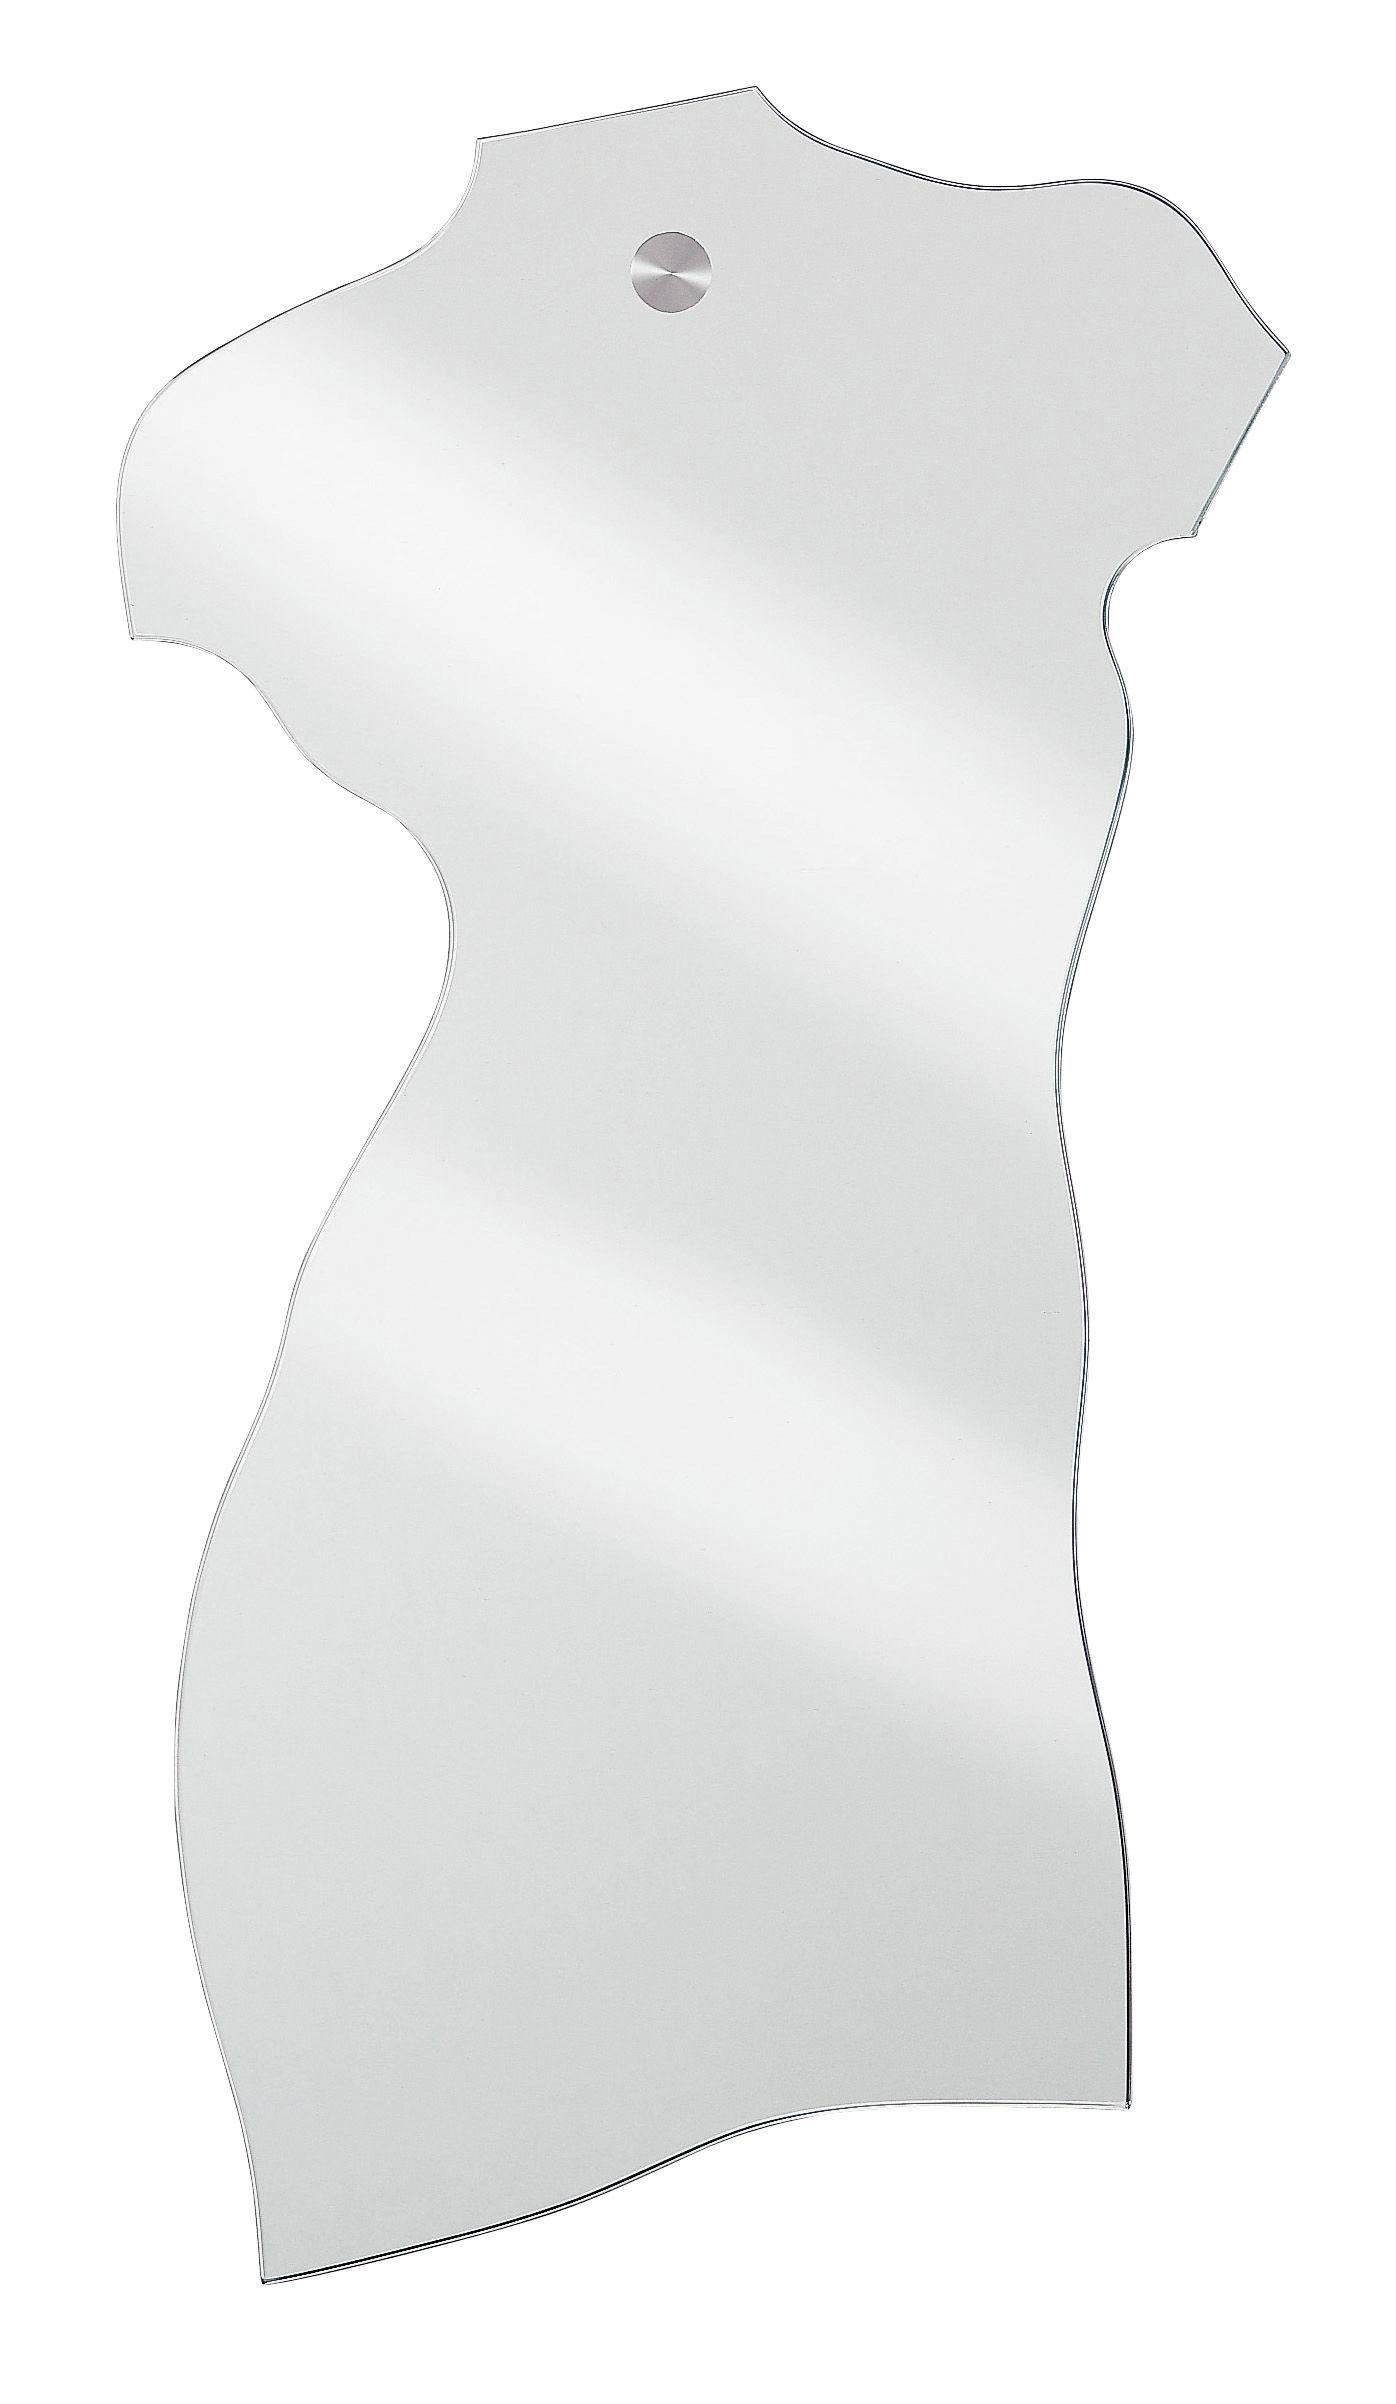 Möbel - Spiegel - Milo Wandspiegel - Zanotta - Spiegel -